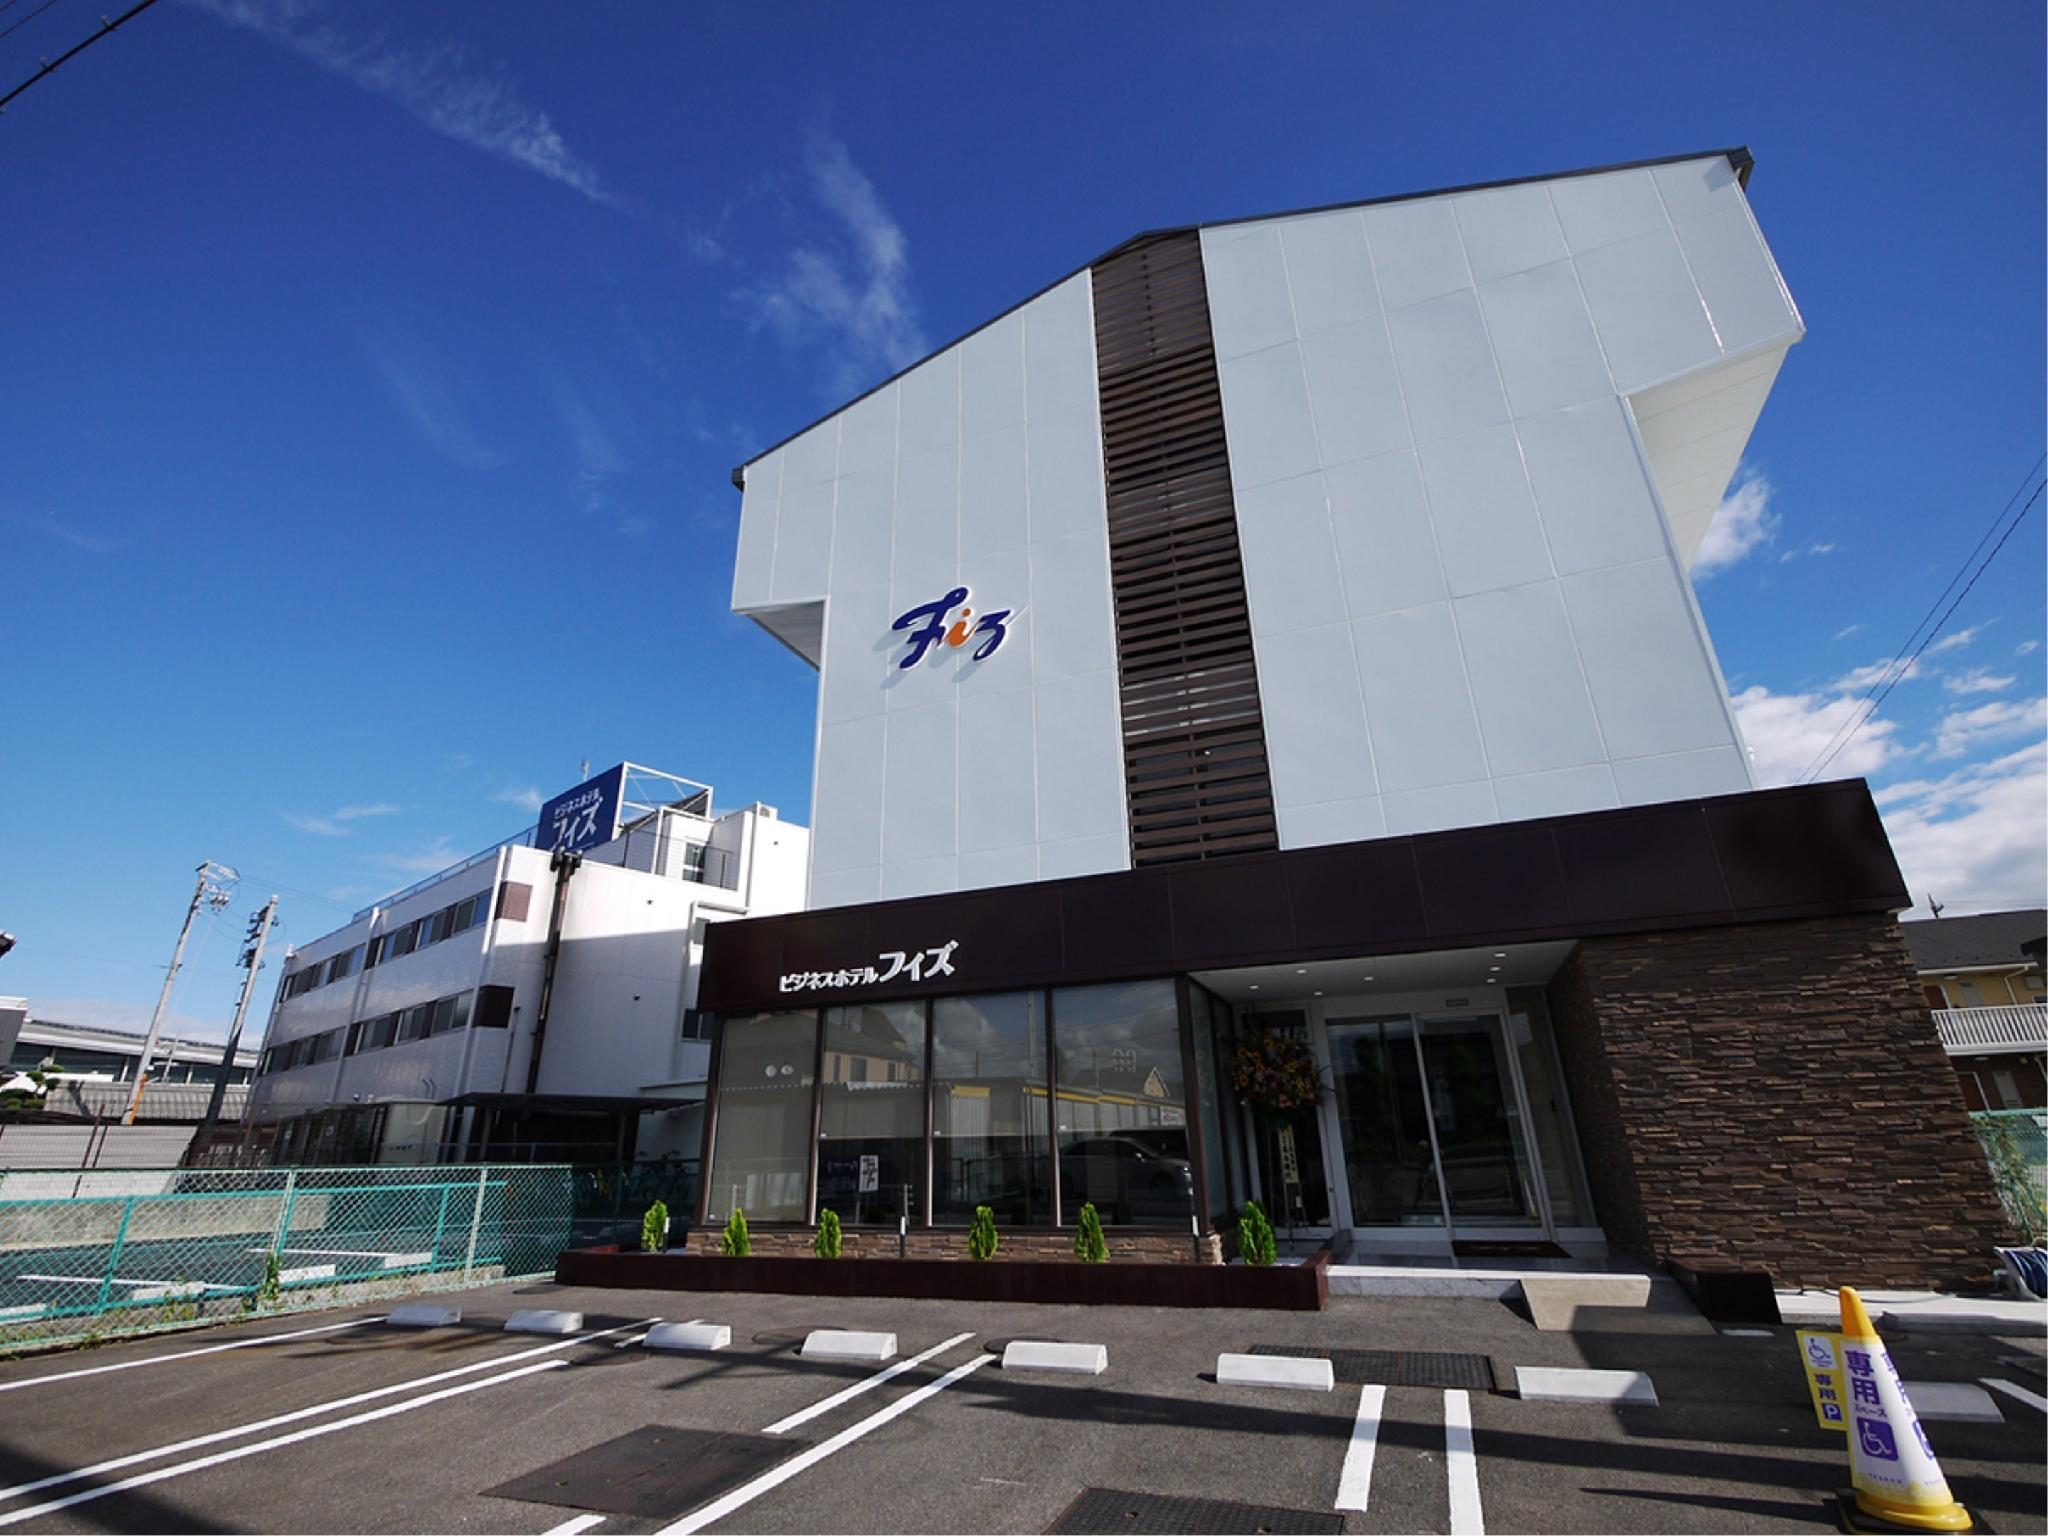 Business Hotel Fizz Naya Airport